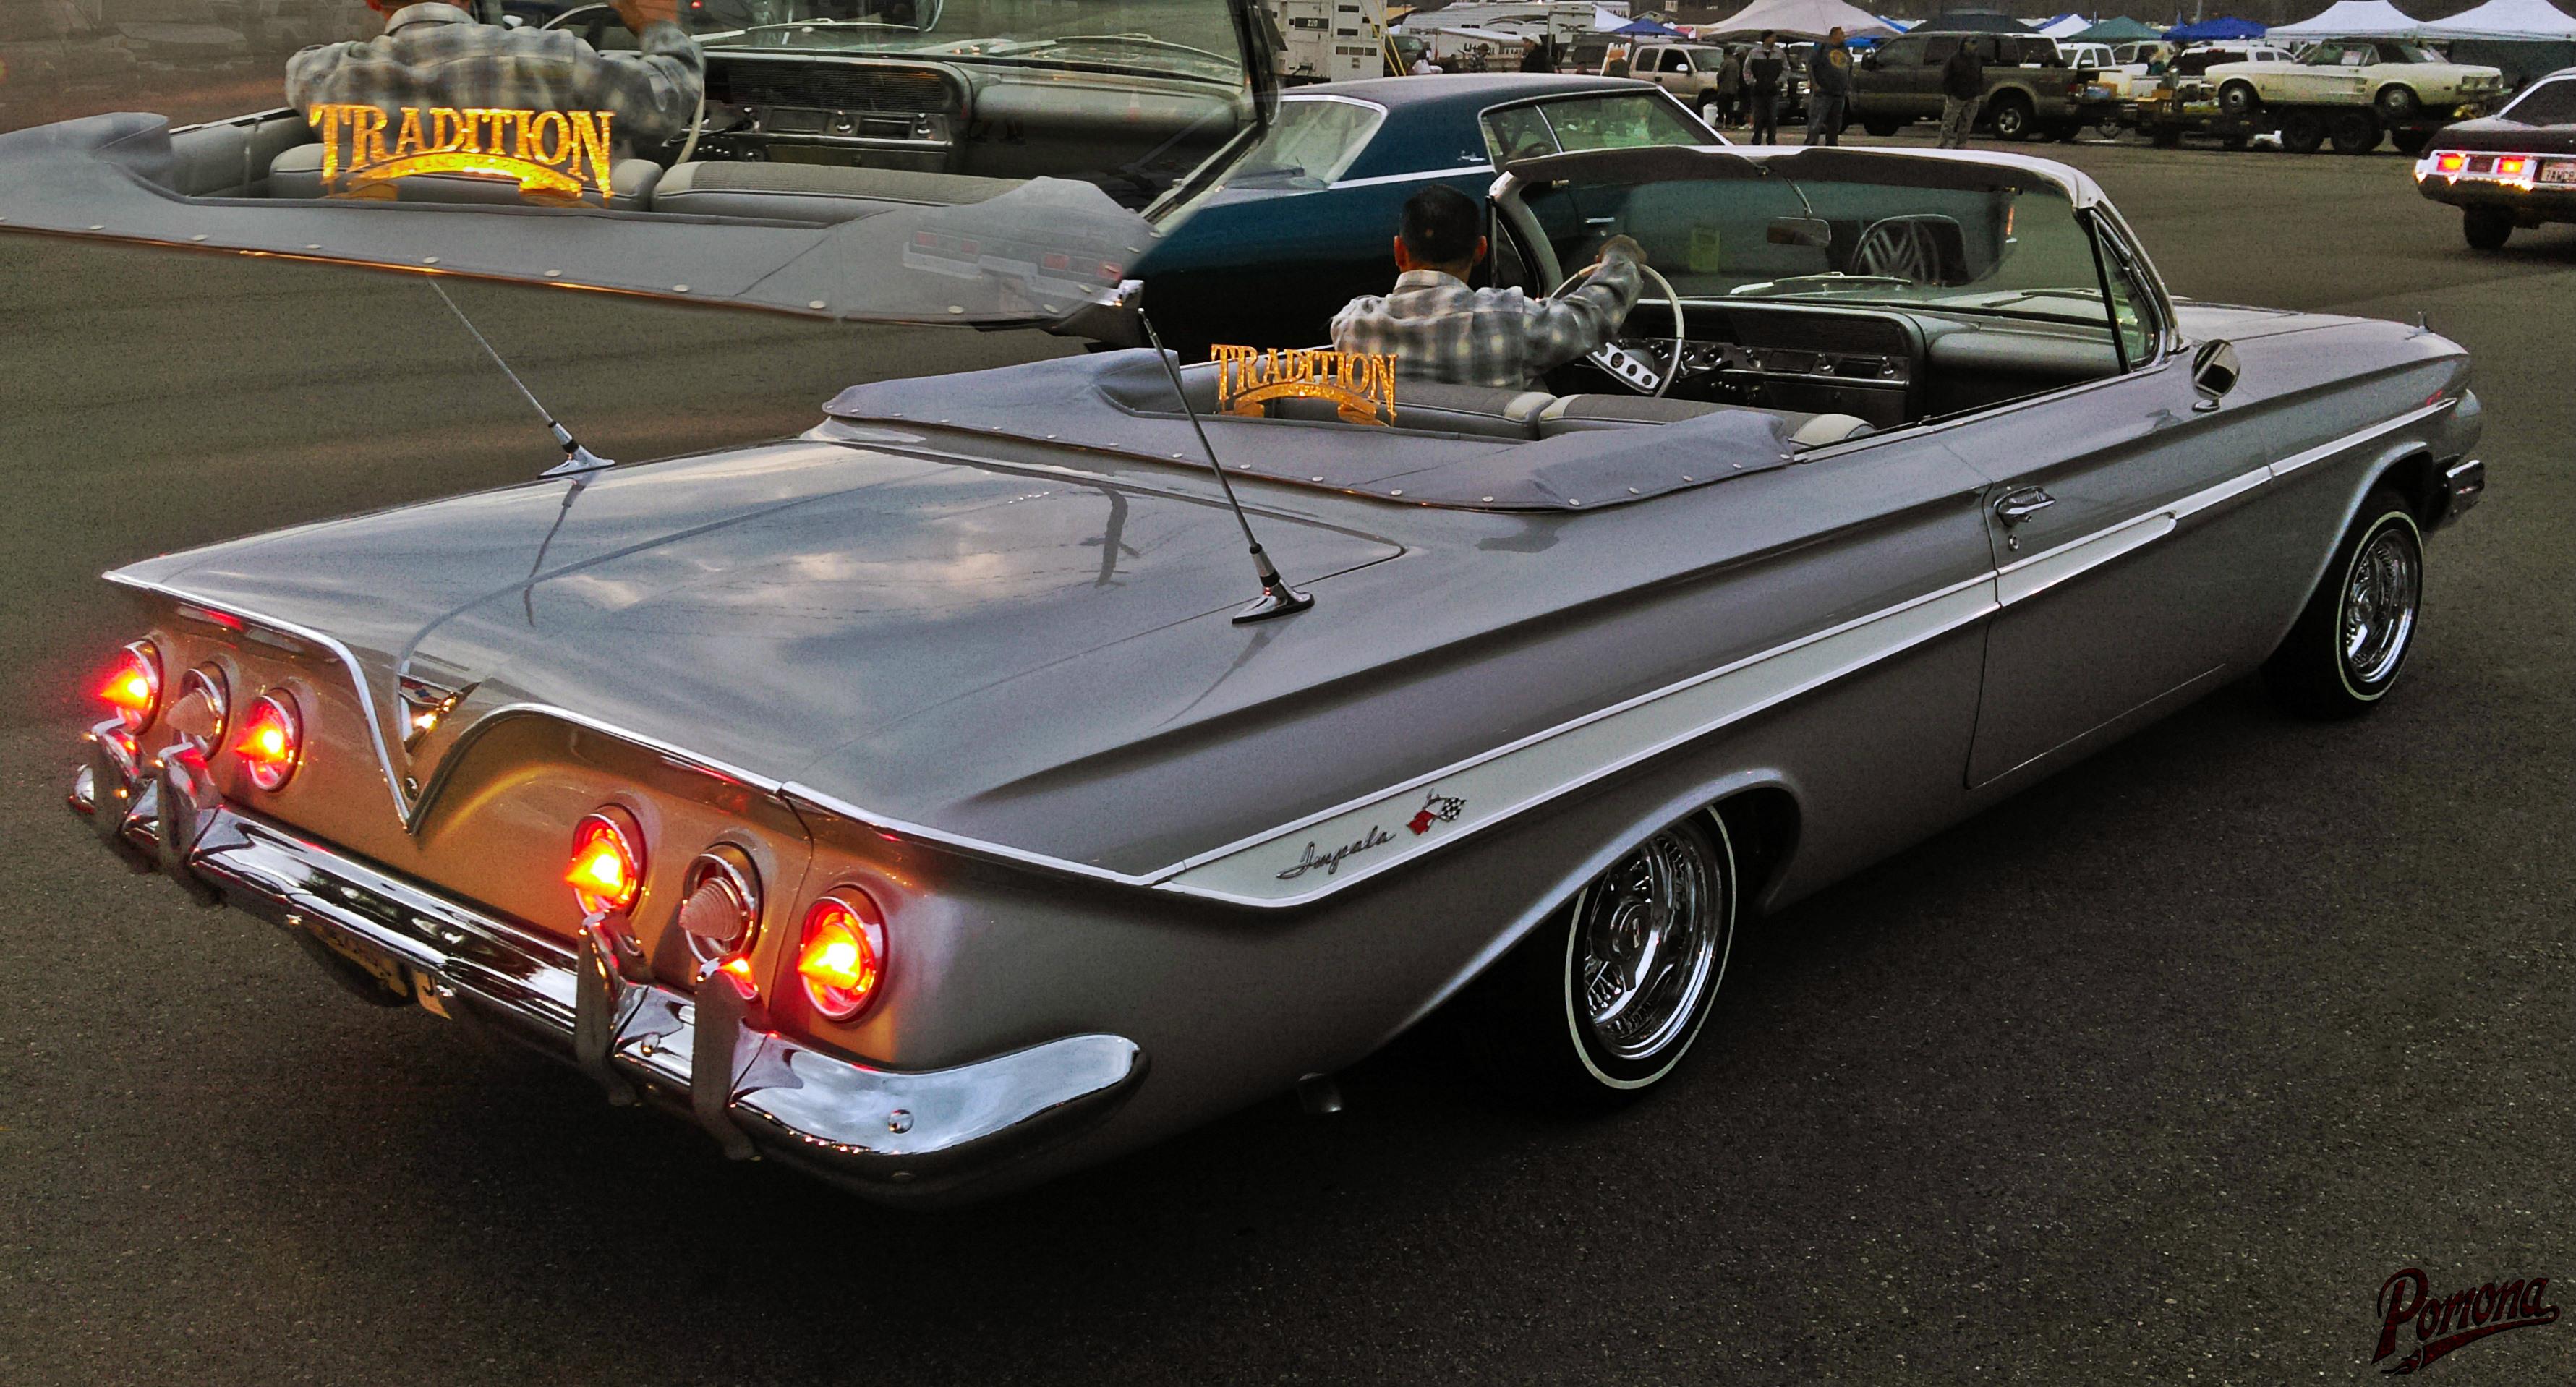 Tradition CC - 1961 Impala